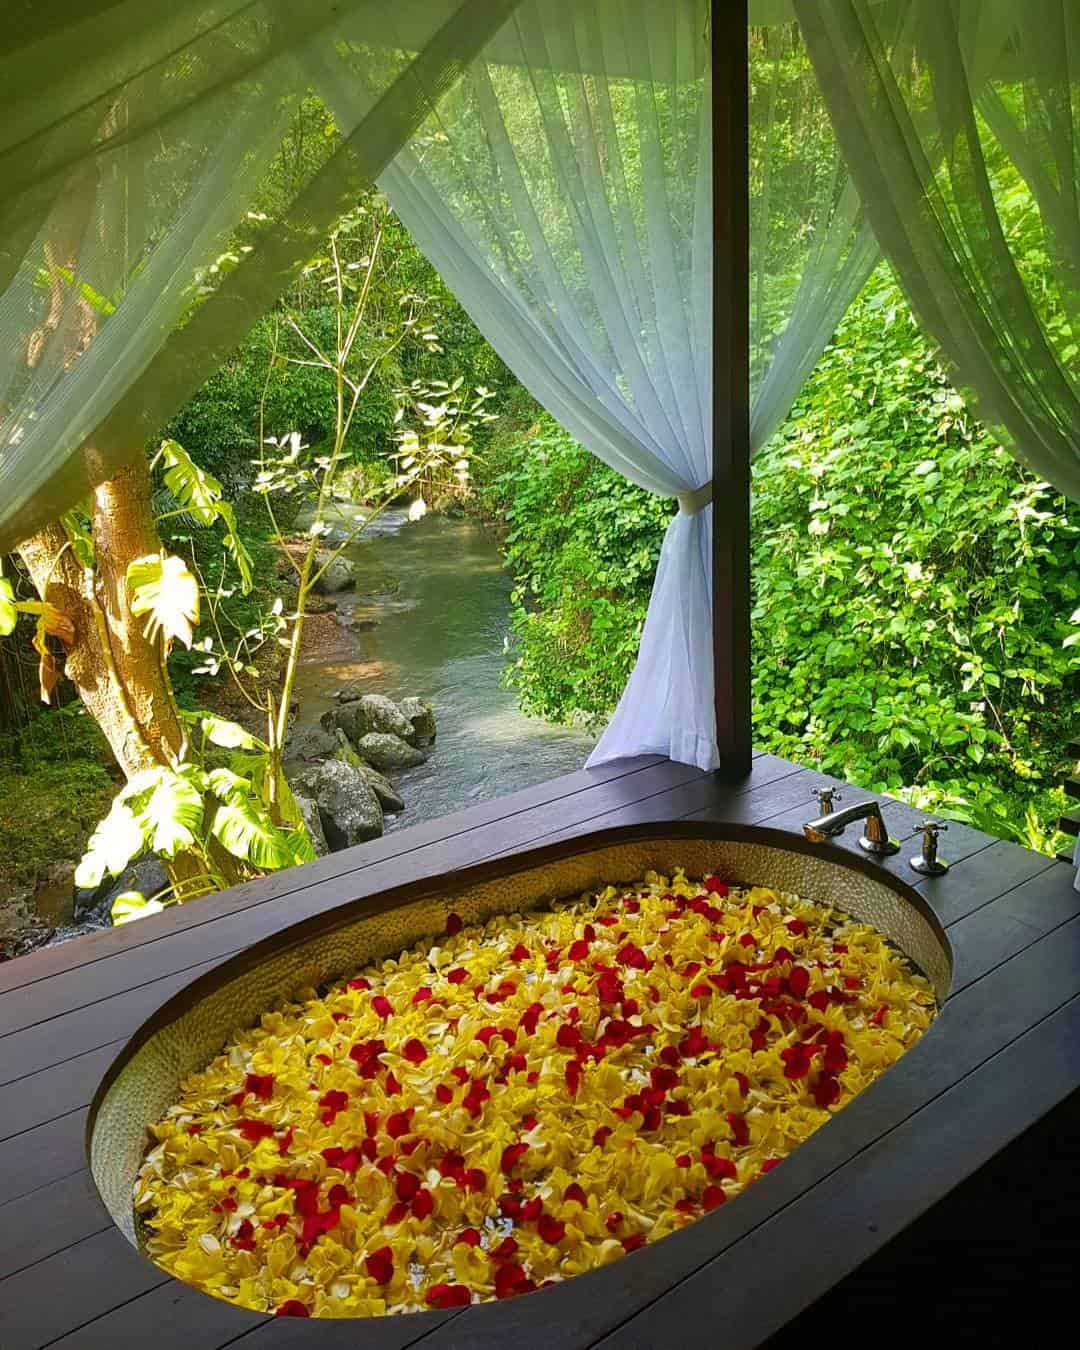 Harmonize with nature when you book this Balinese spa at Maya Ubud through  Klook . Image credit: Spa at Maya Ubud